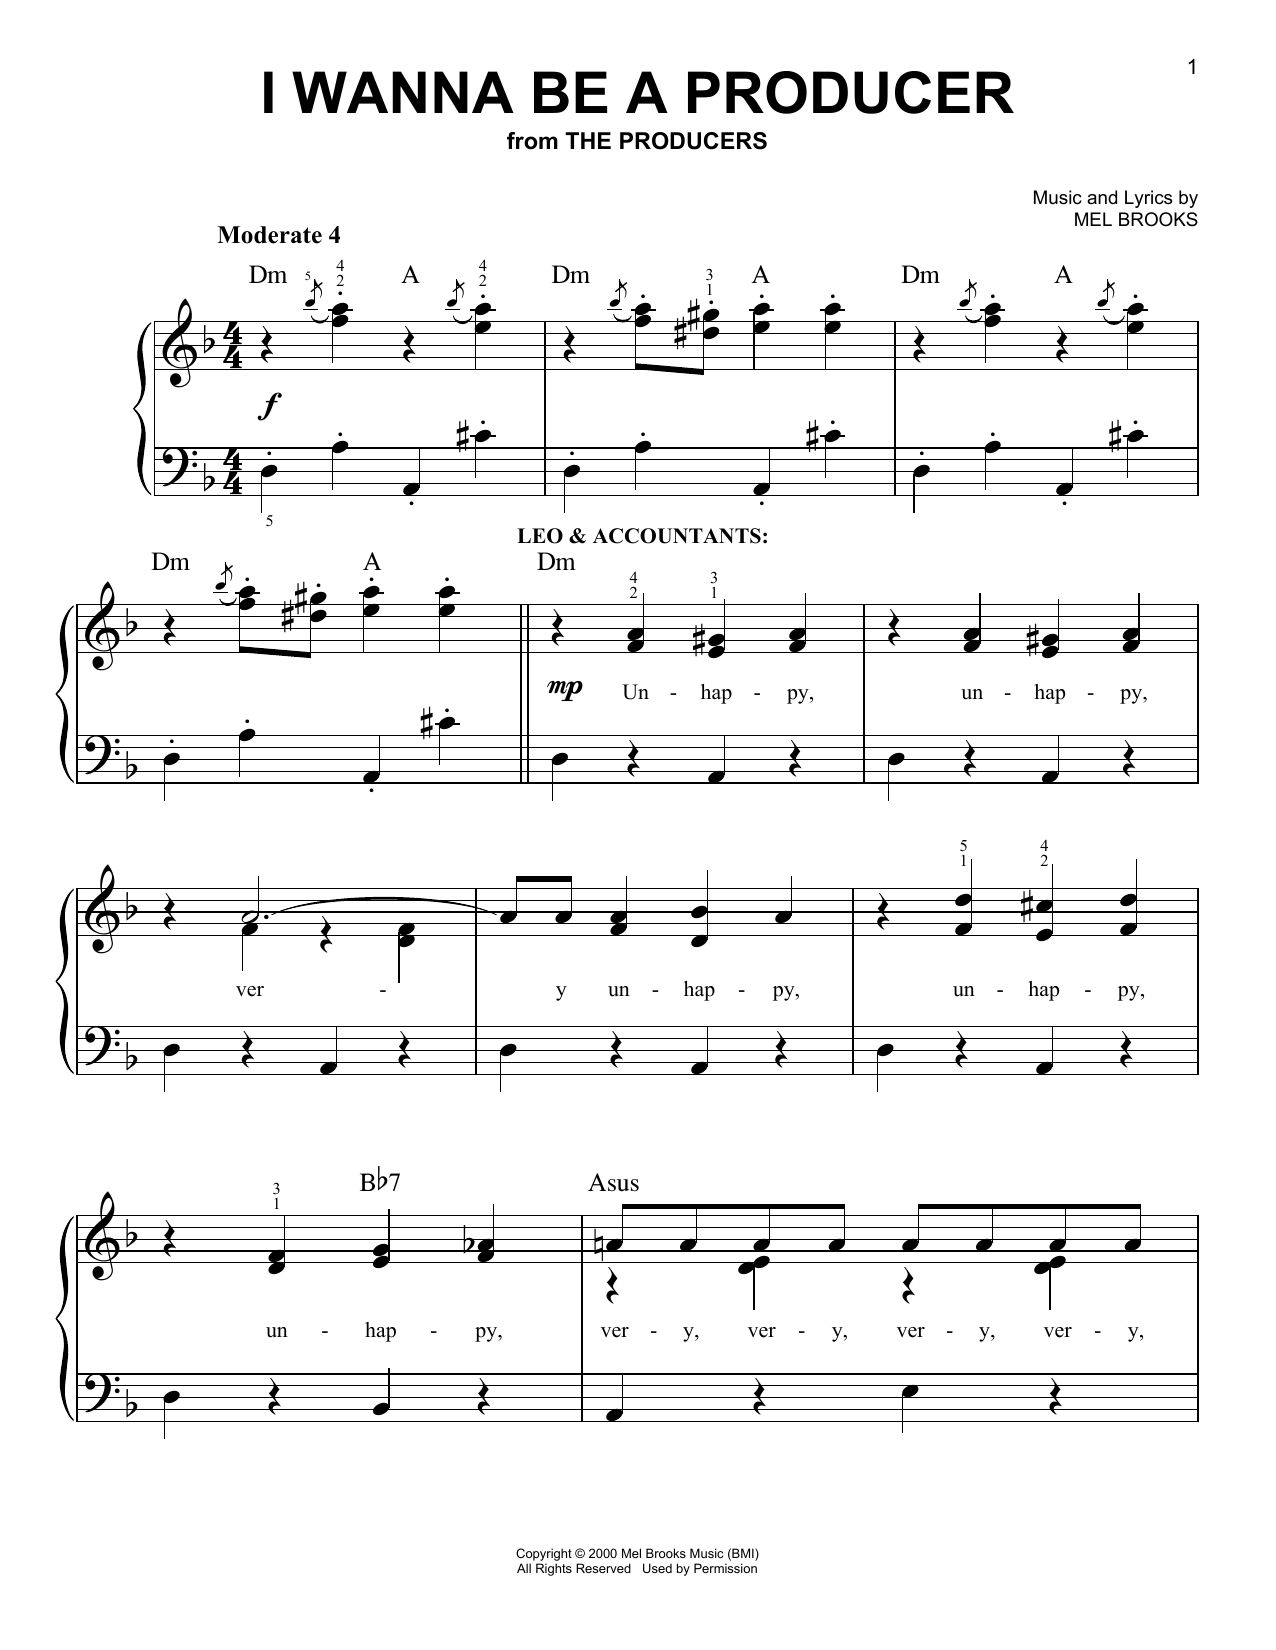 I Wanna Be A Producer sheet music